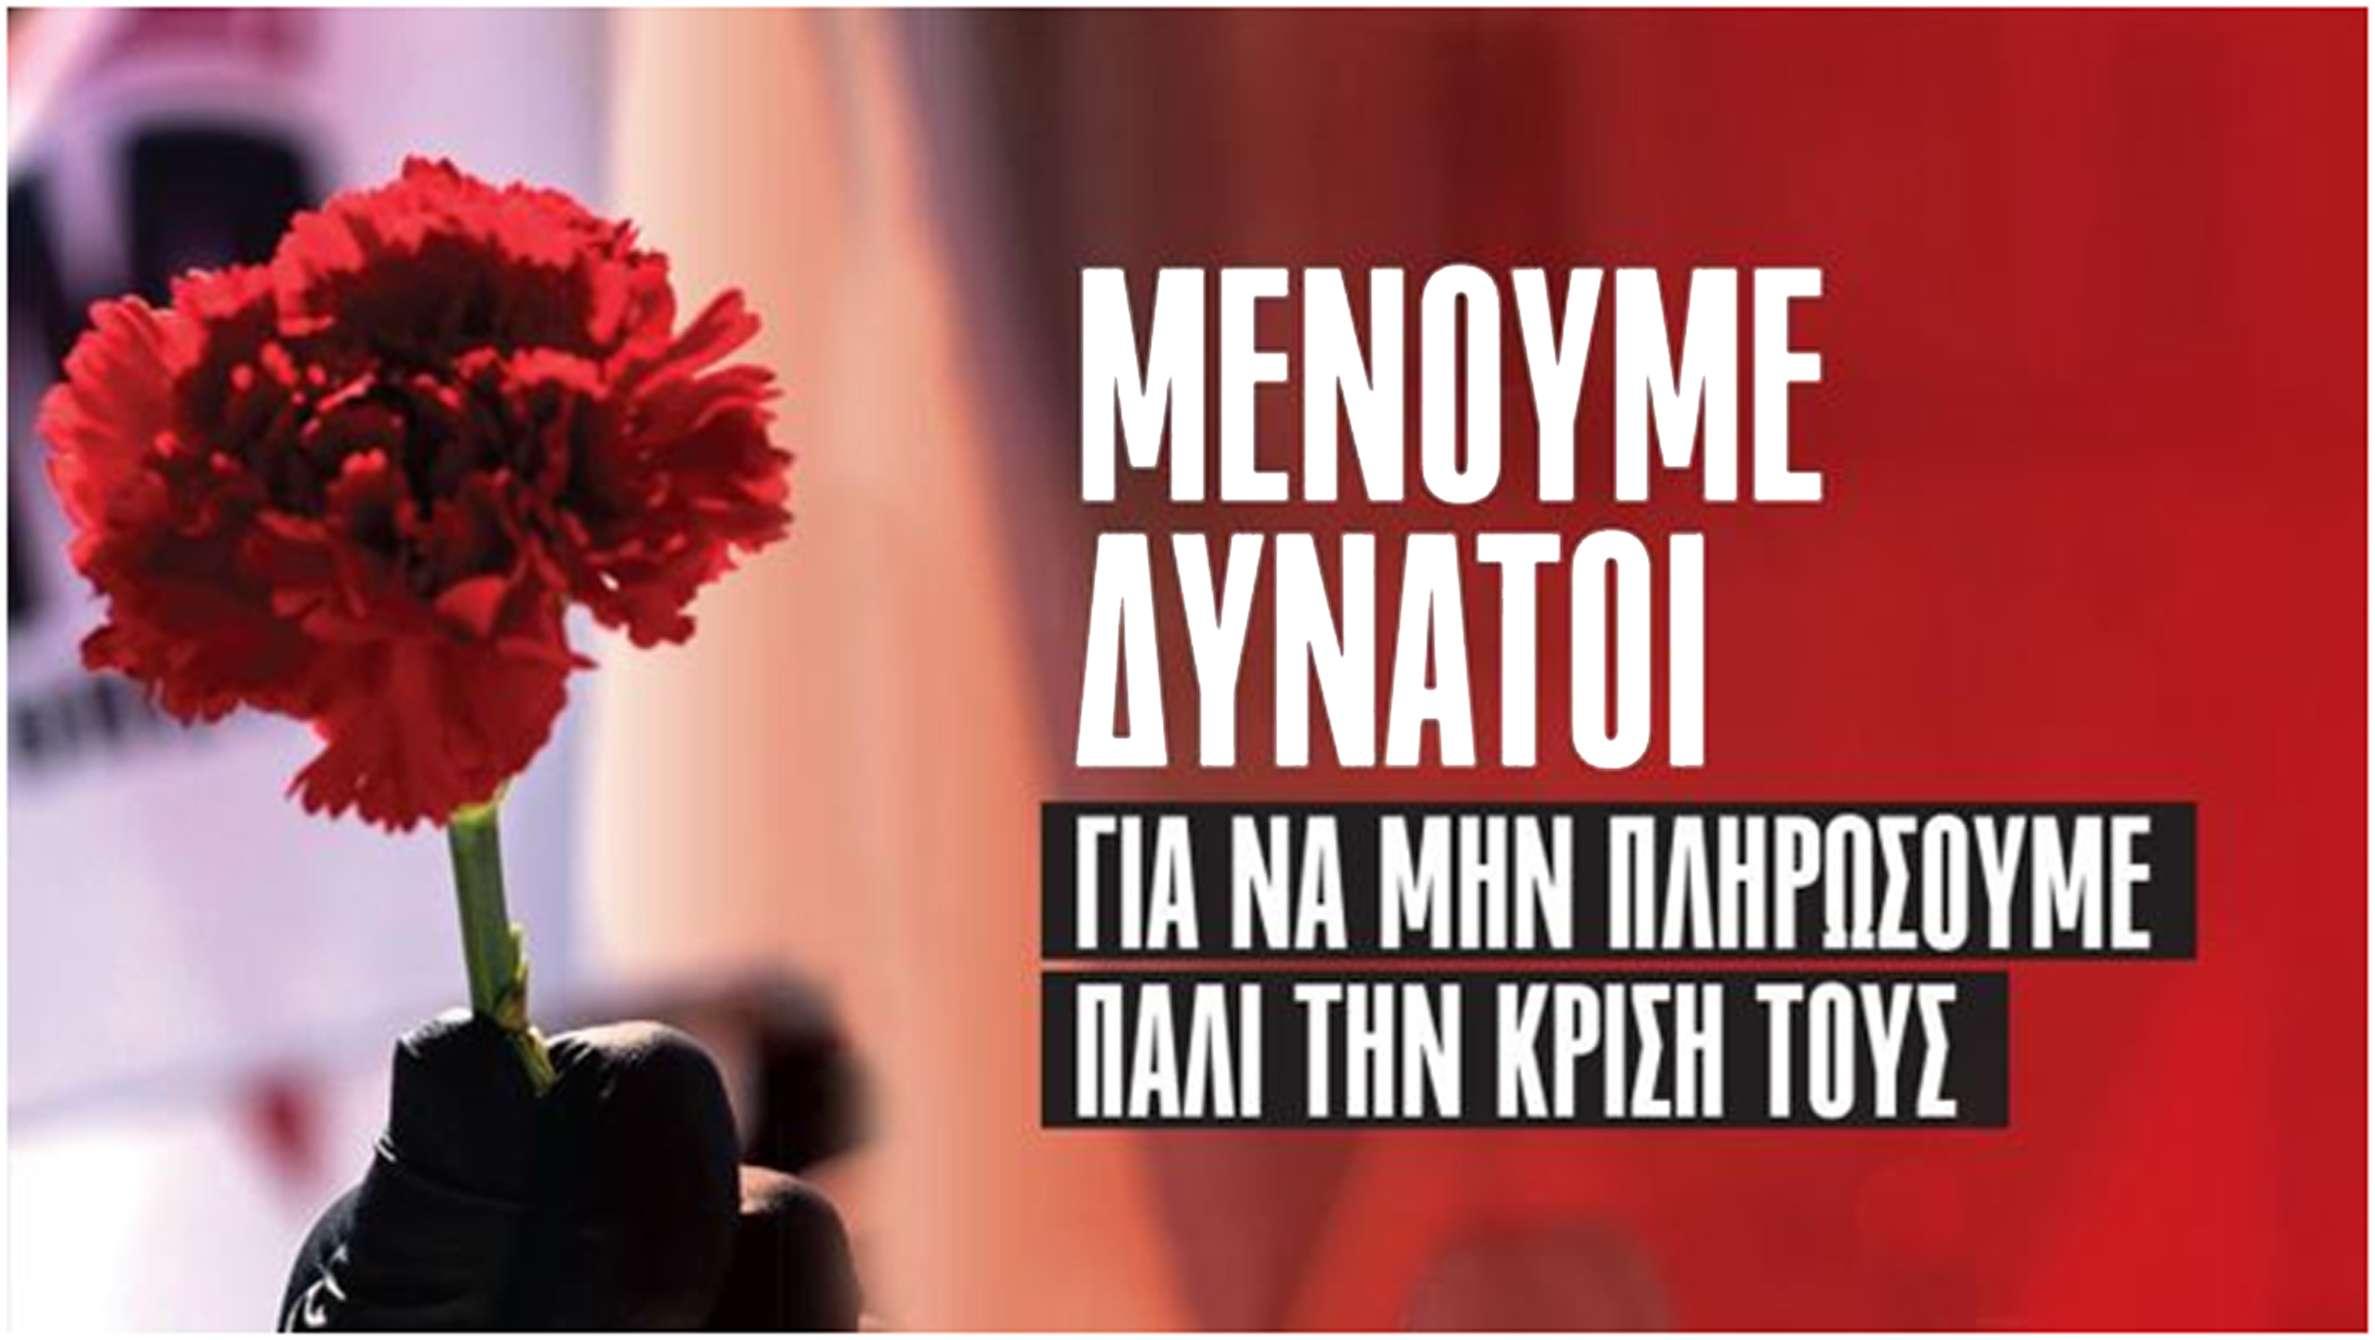 KKE Μένουμε Δυνατοί για να μην πληρώσουμε πάλι την κρίση τους